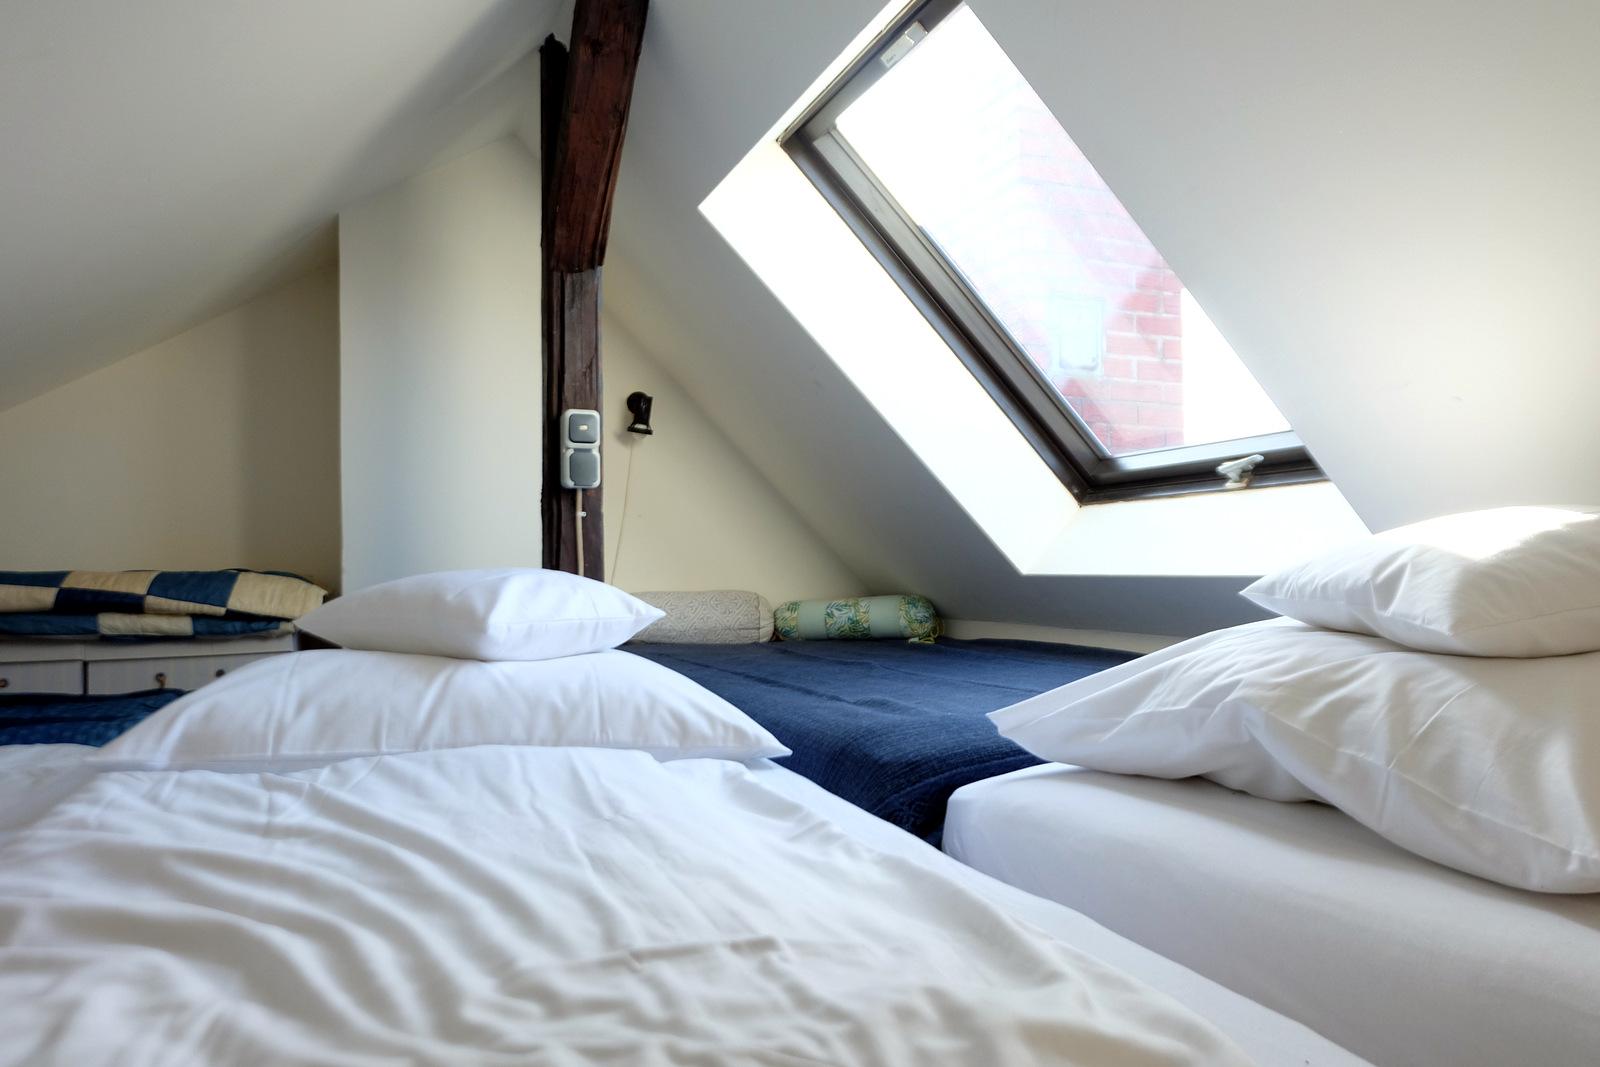 dscf1592 Roof apartment %Bockenheim